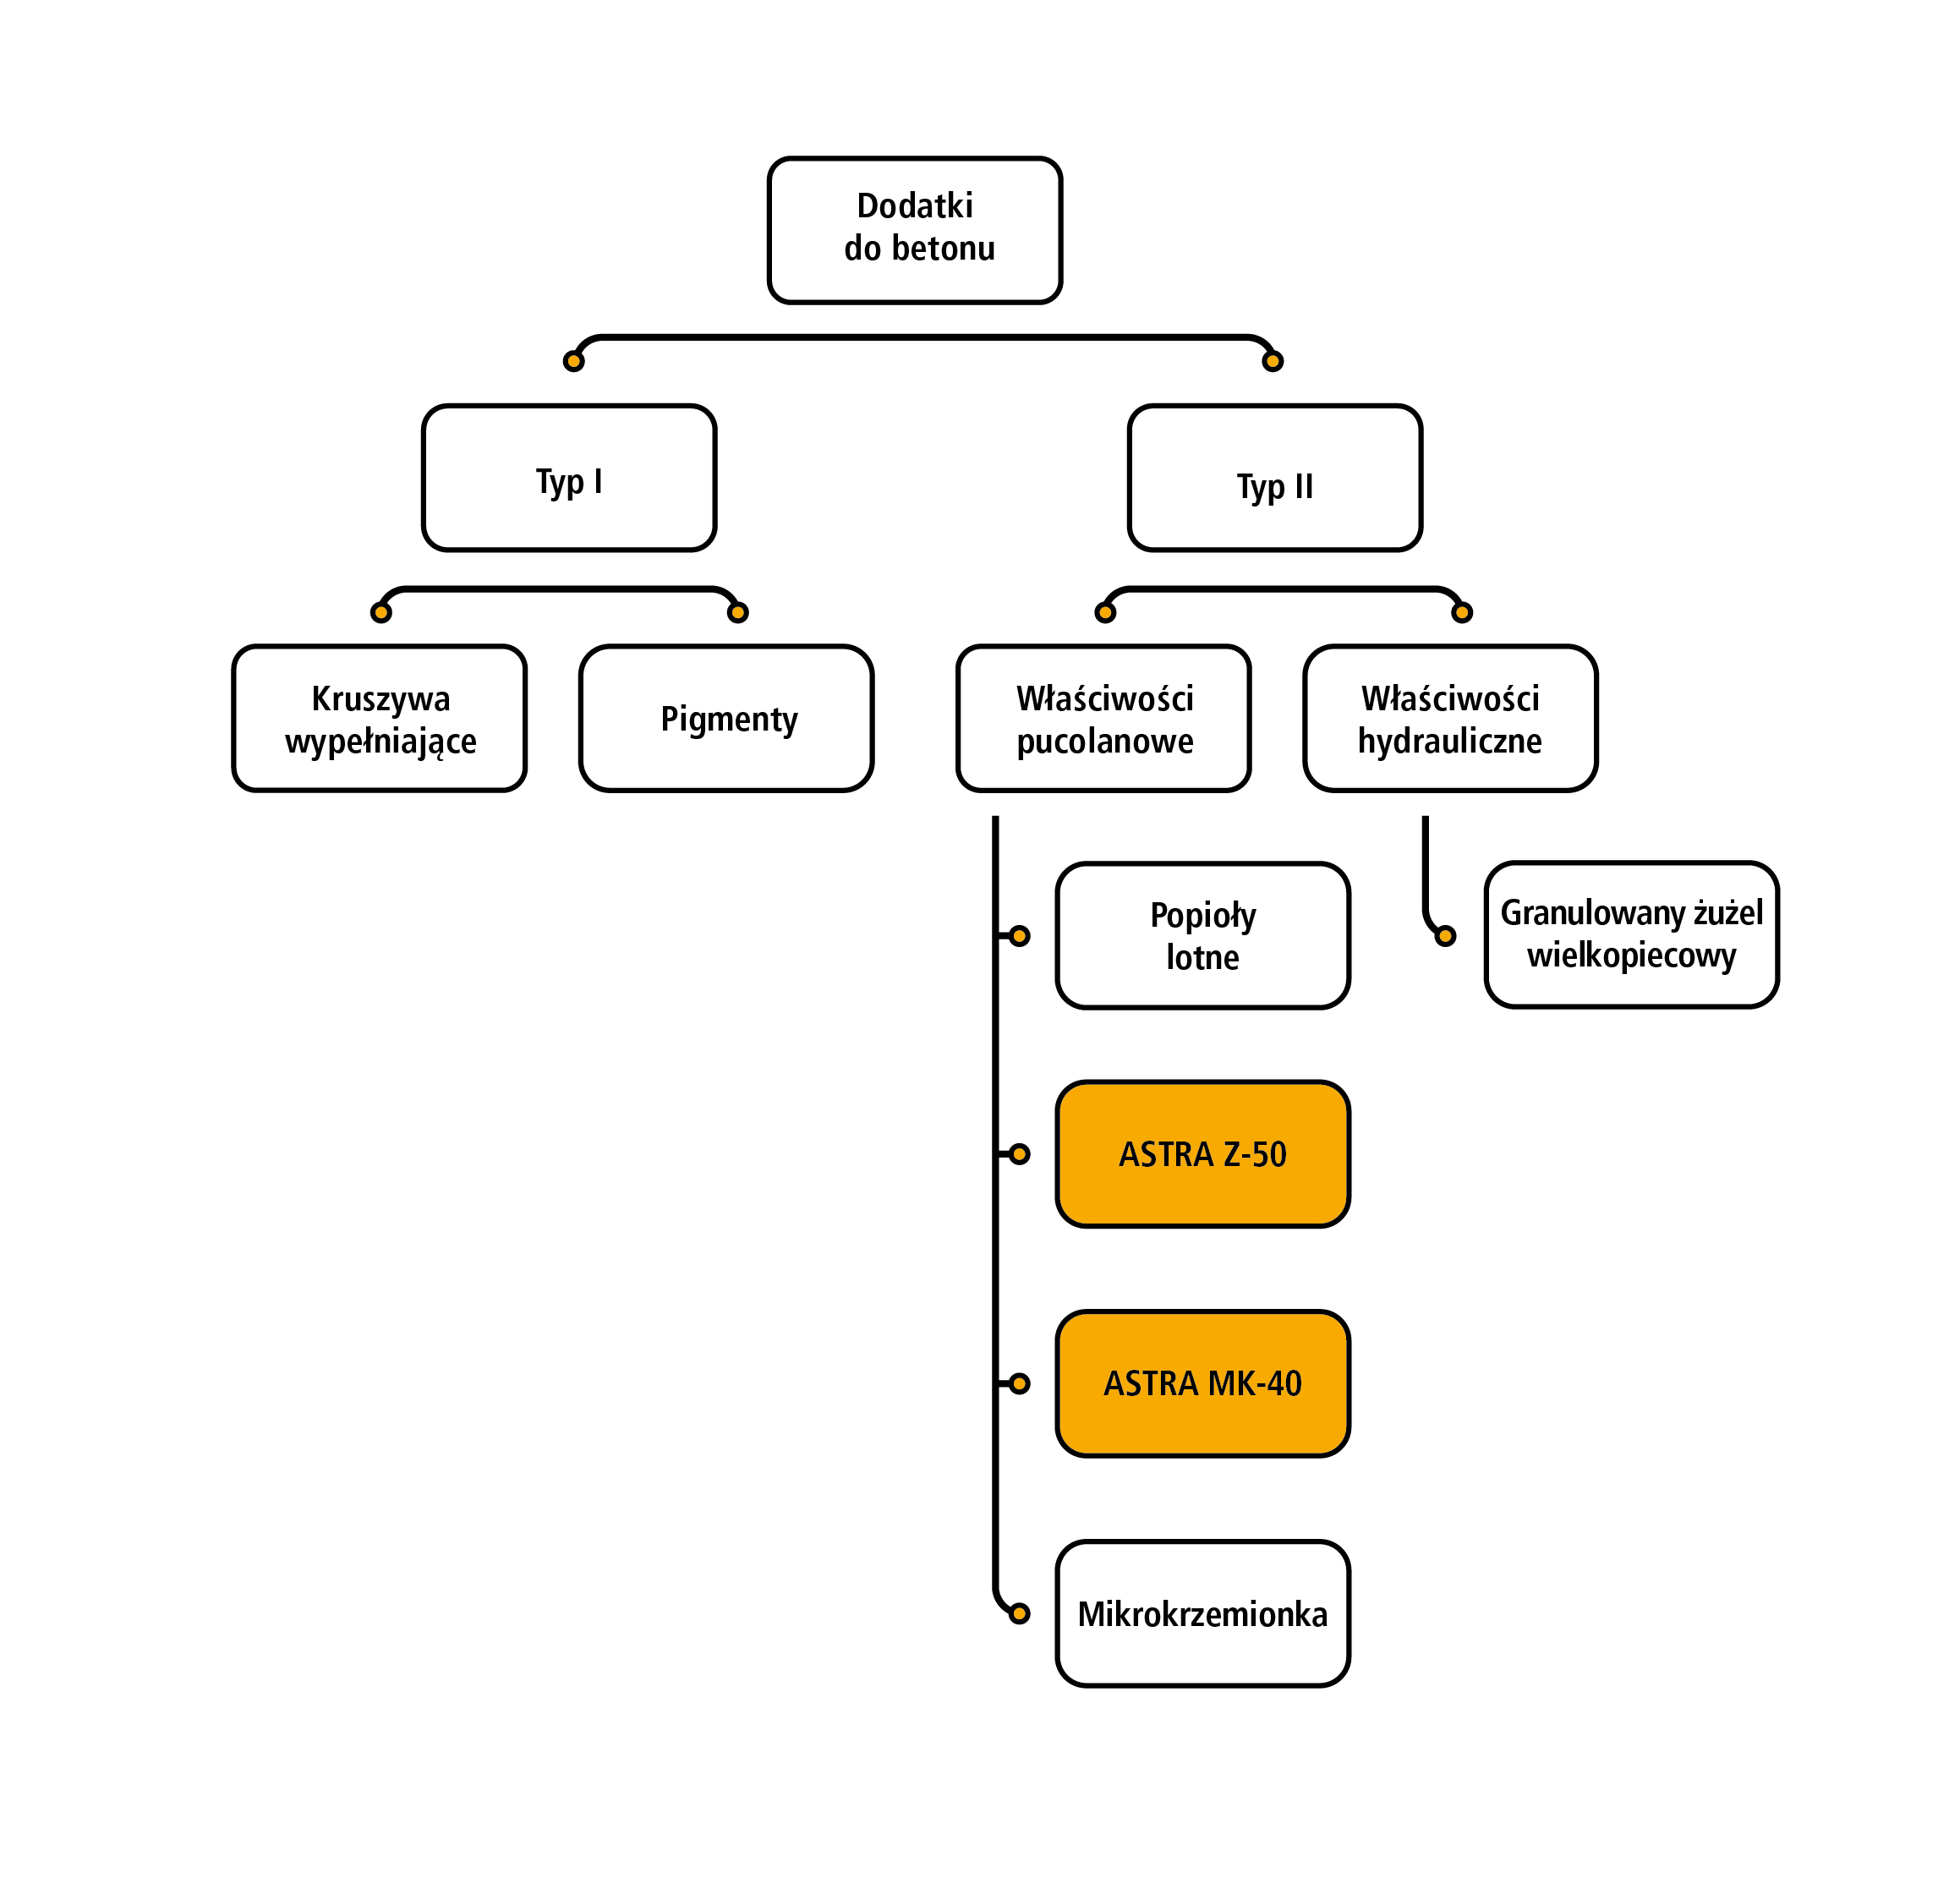 Rysunek 1. Klasyfikacja dodatków do betonu i oferowane dodatki mineralne ASTRA wg PN-EN 206:2014-04